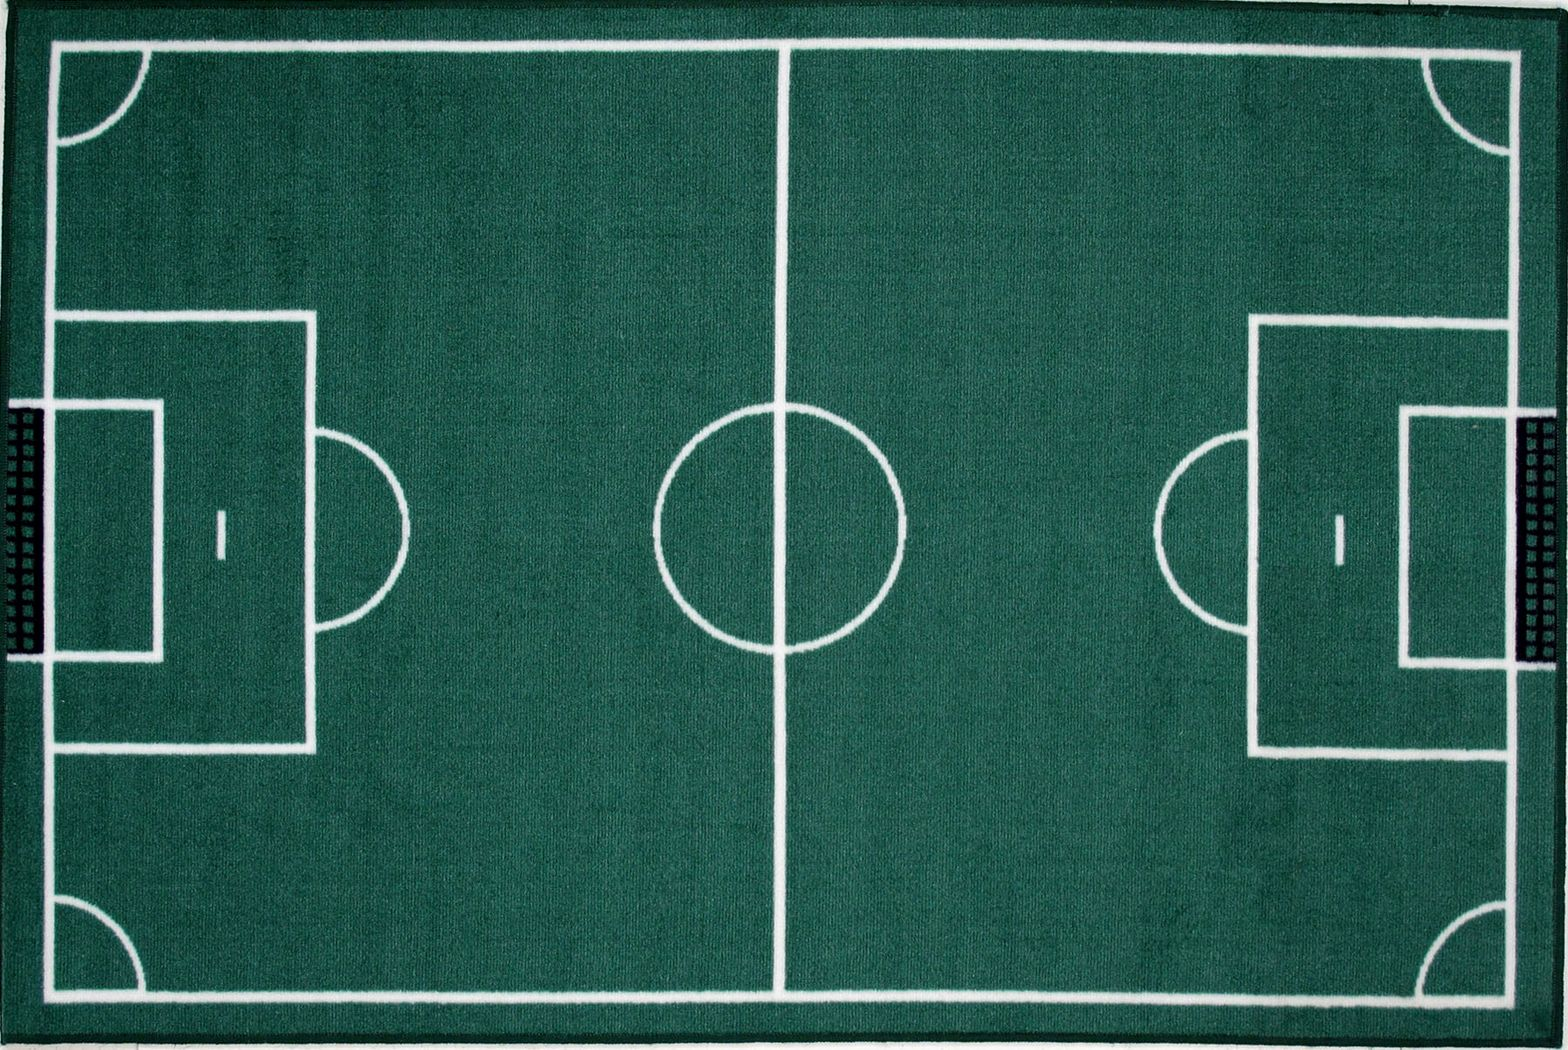 Kids Basic Training Green Soccer Field 3'2 x 4'8 Rug